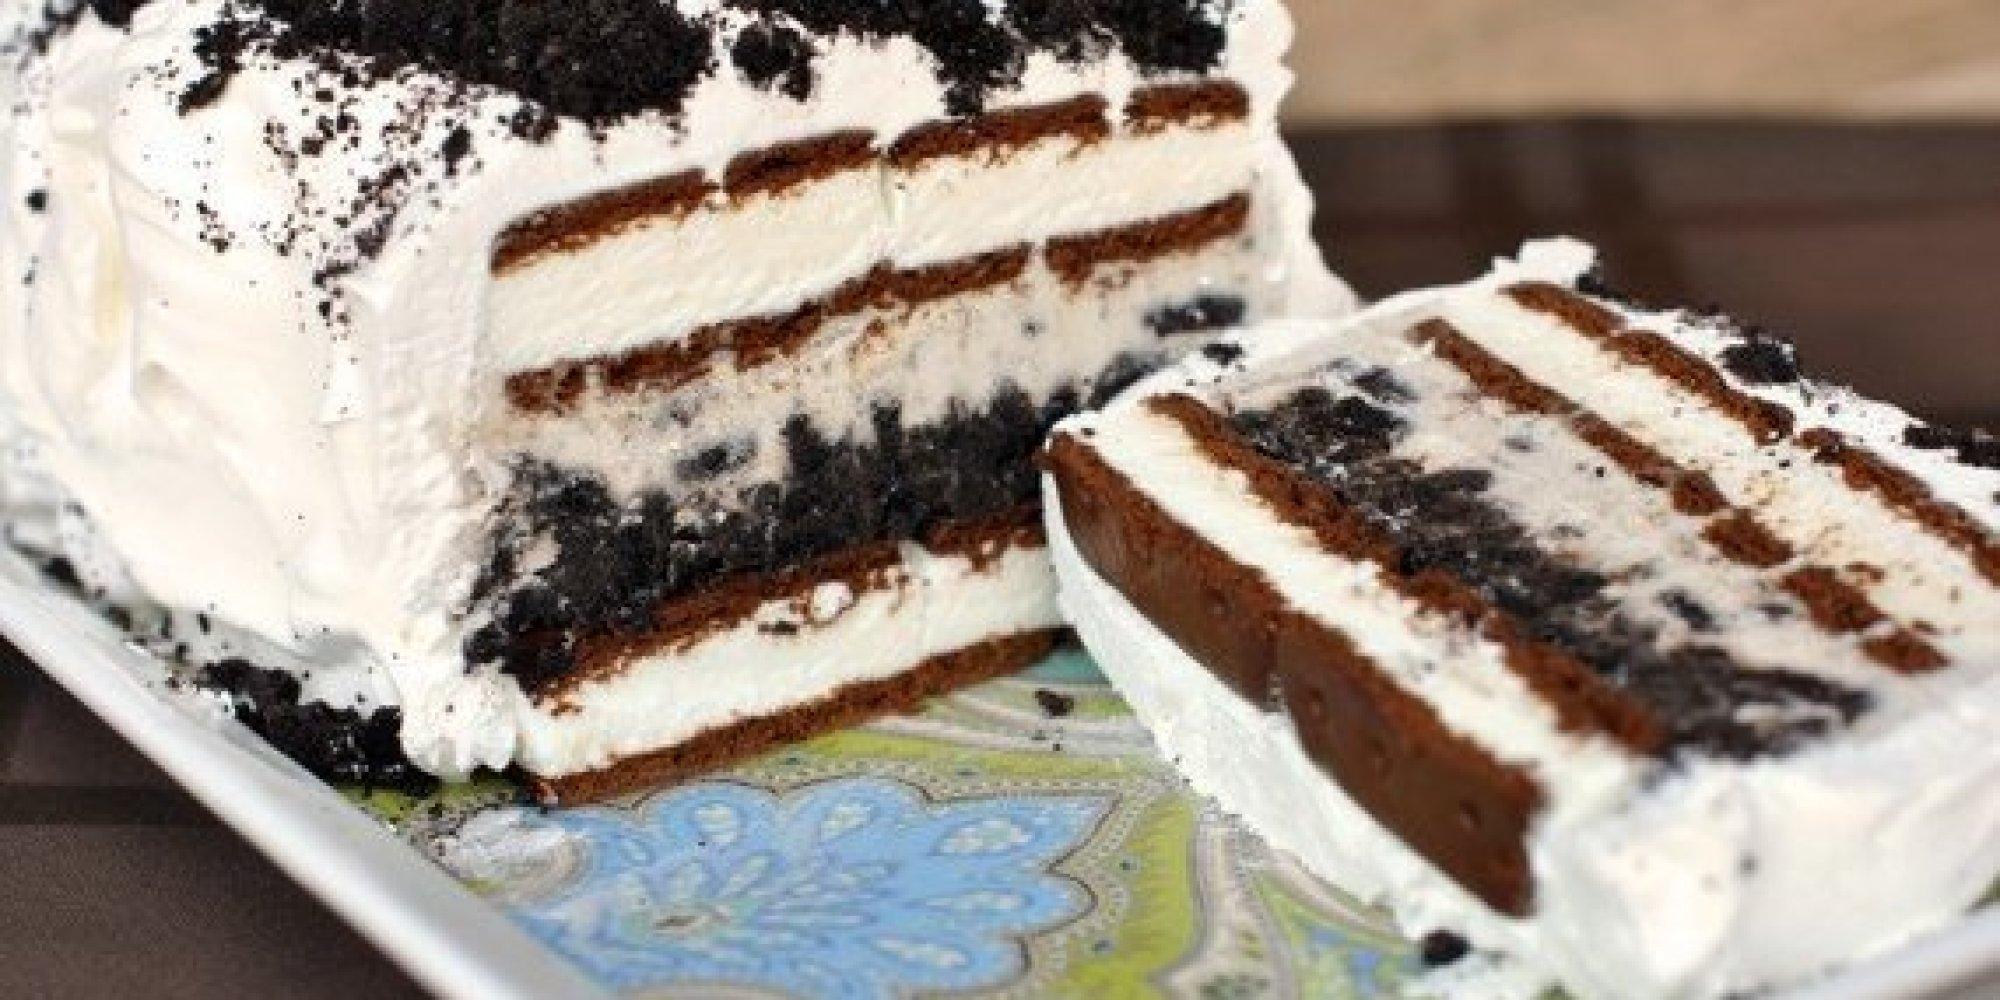 Homemade Ice Cream Cake For Birthday